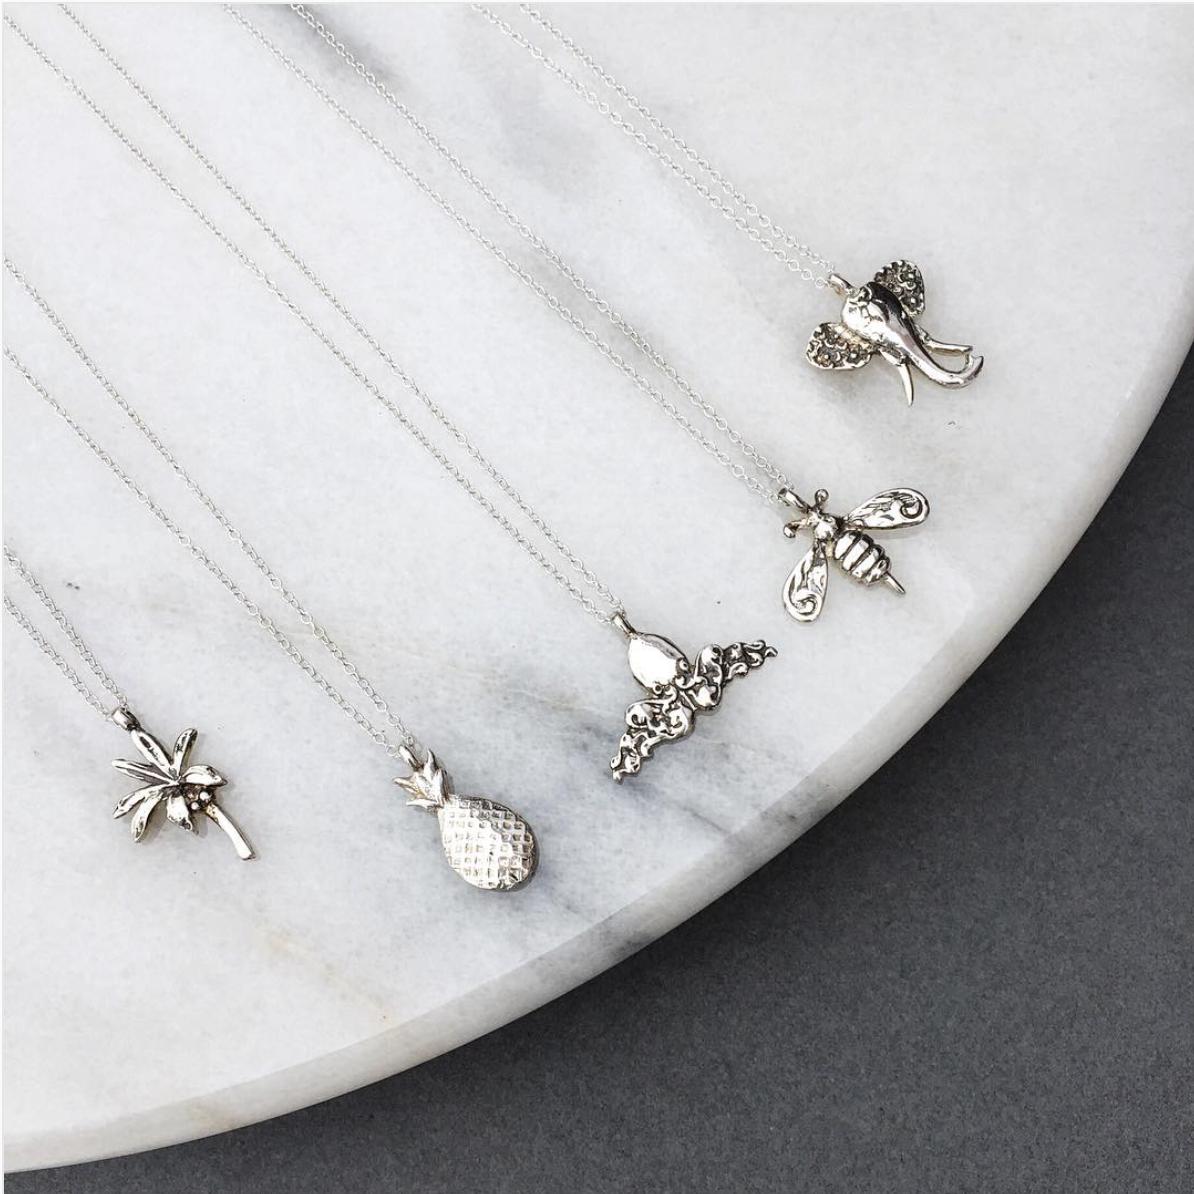 Silver_Spoon_Jewelry